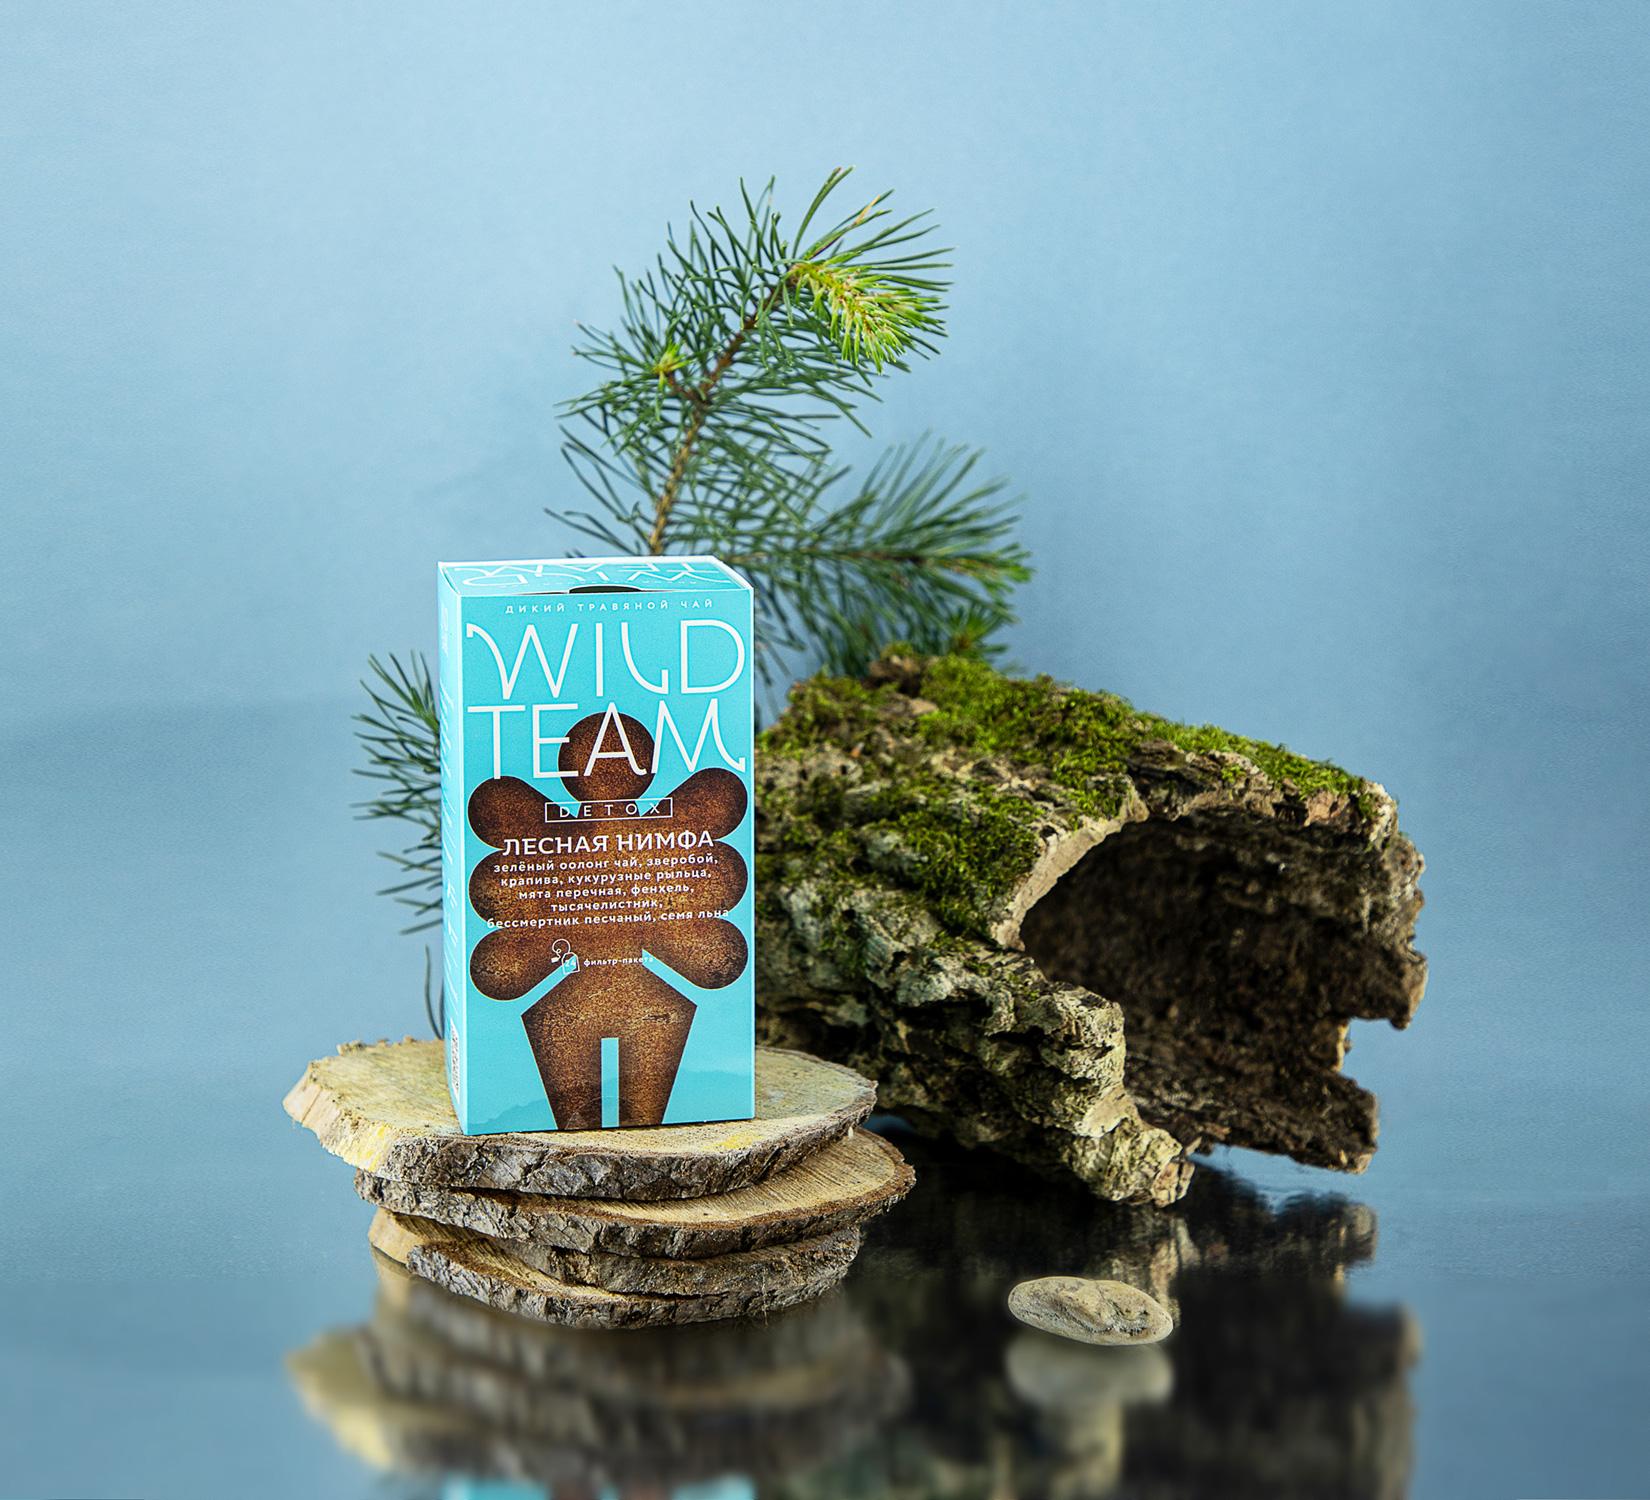 Rebranding the Wild Team Herbal Teas Designed by Ohmybrand